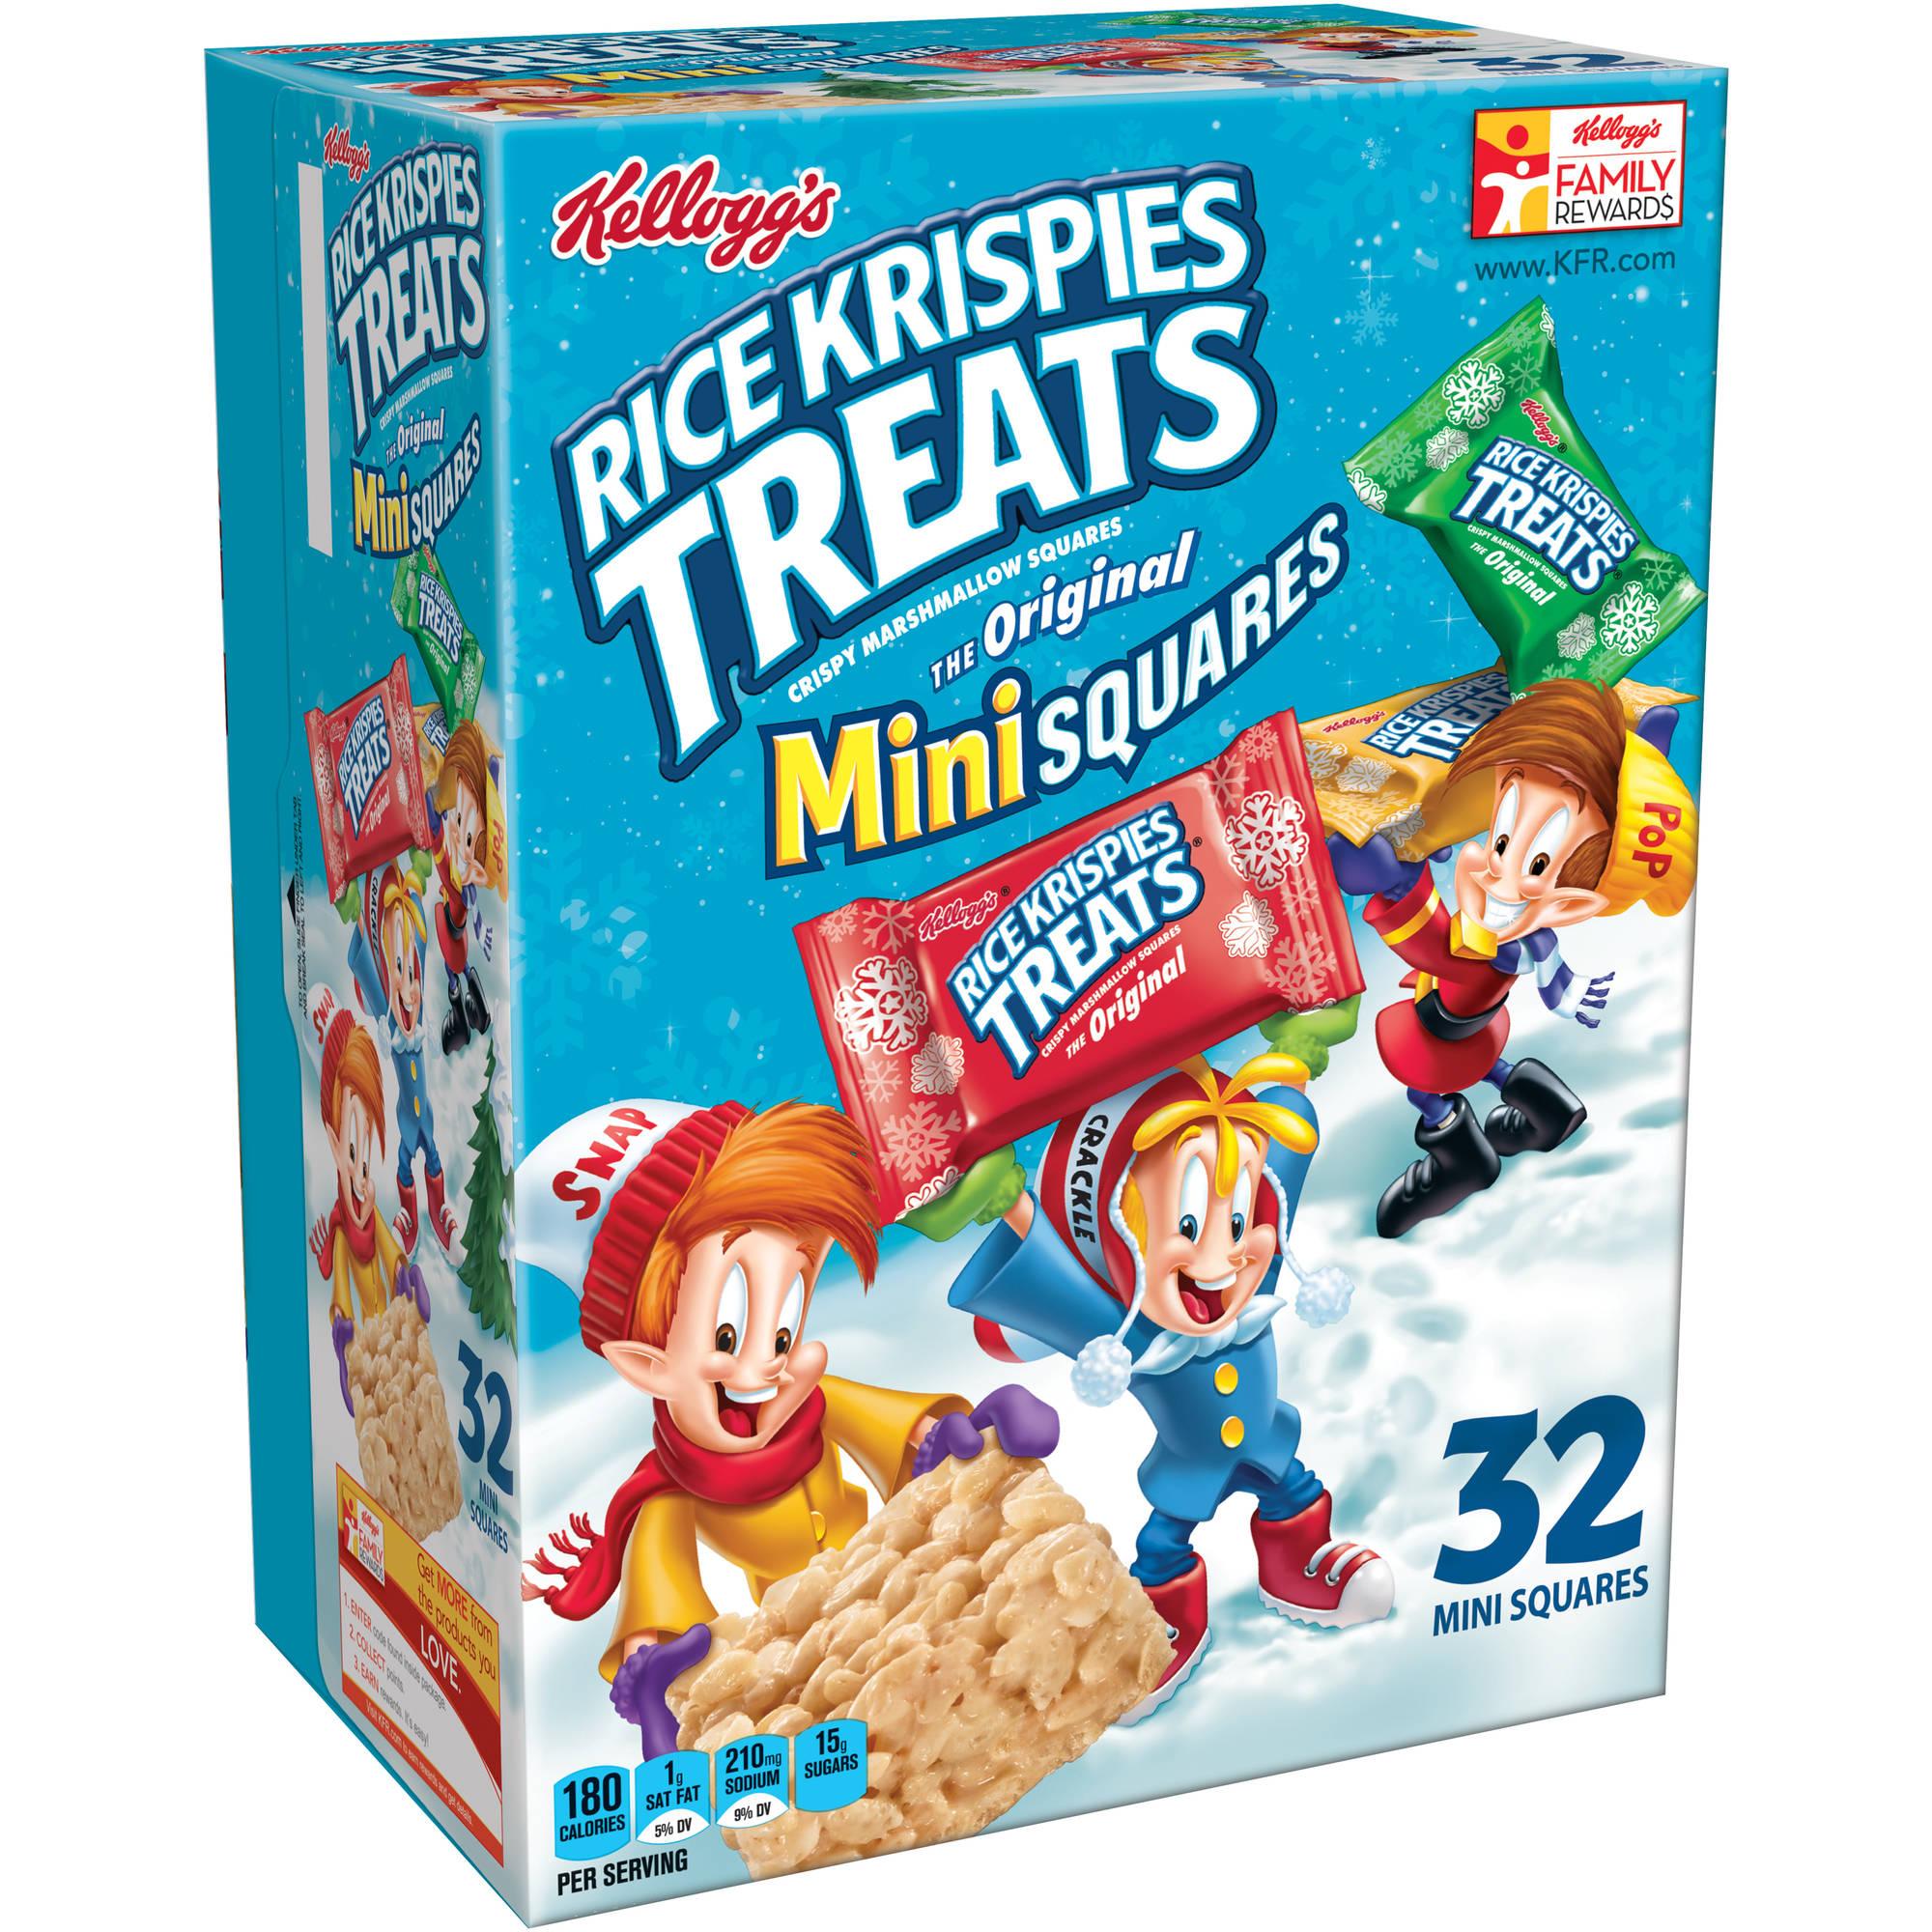 Kellogg's Rice Krispies Treats Marshmallow Mini-Squares, 32 ct 12.4 oz